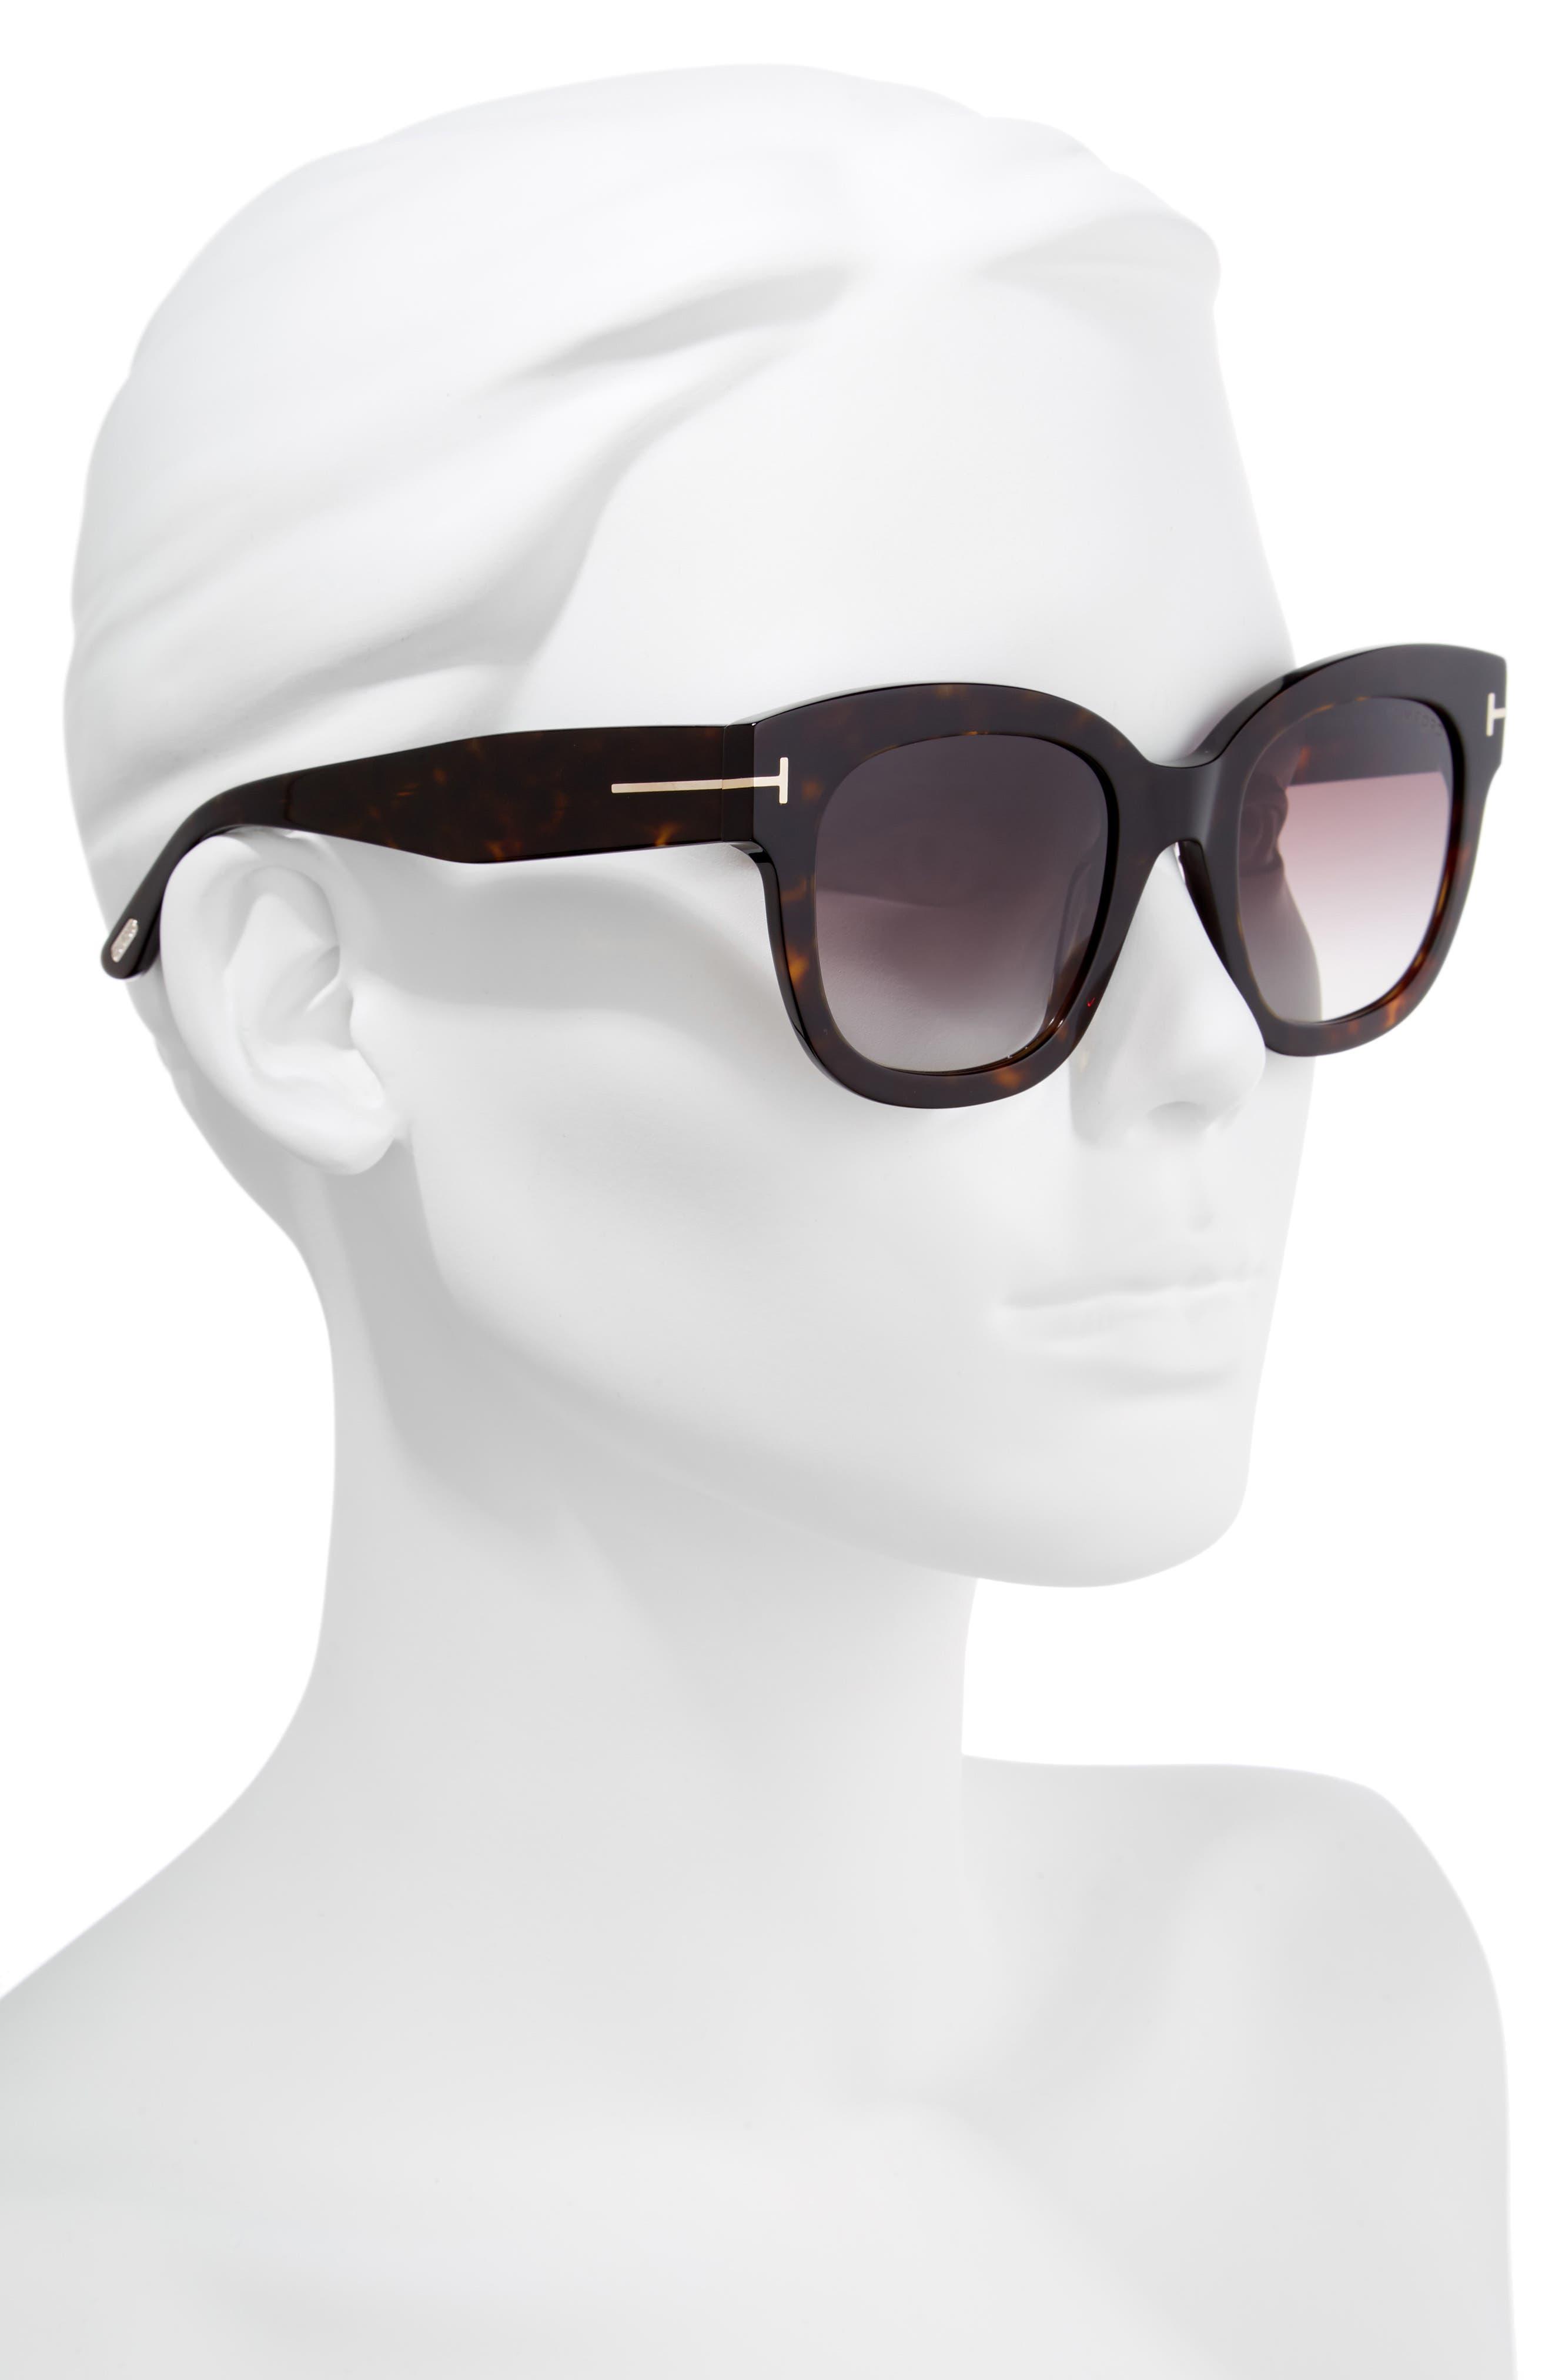 Beatrix 52mm Sunglasses,                             Alternate thumbnail 2, color,                             Dark Havana/ Gradient Bordeaux